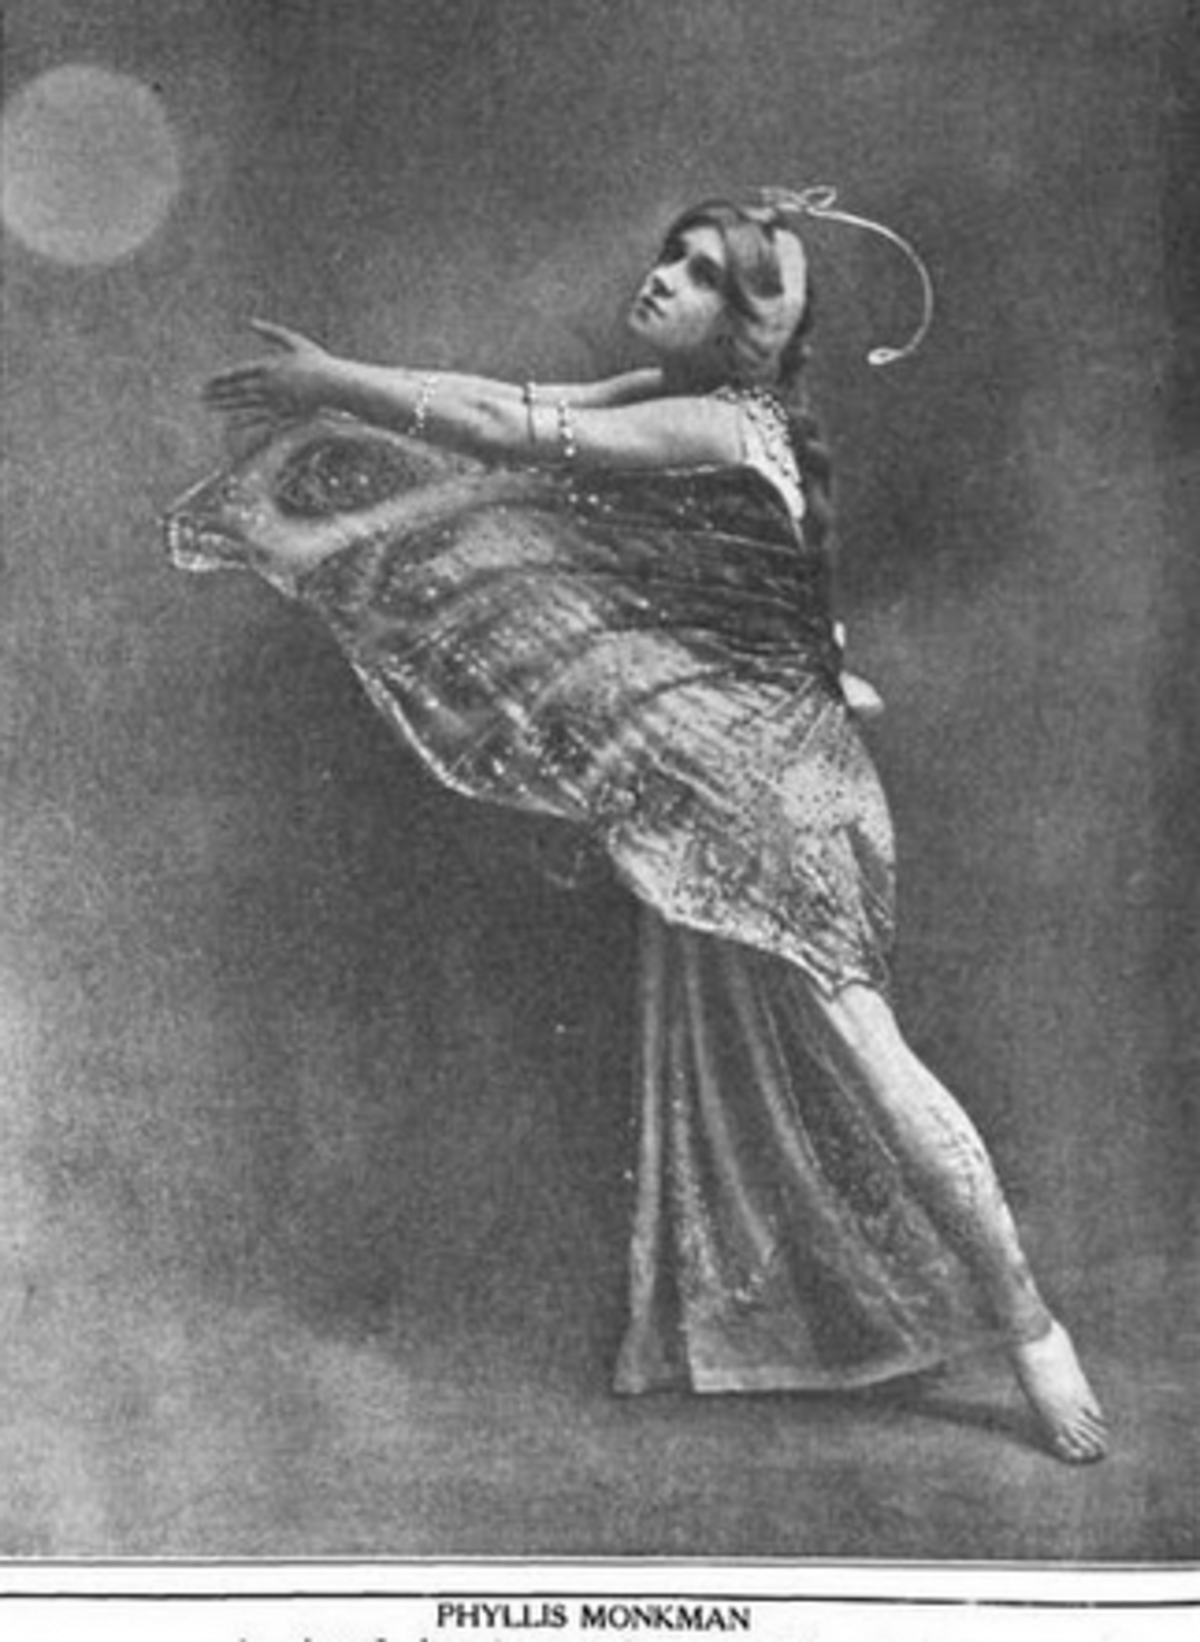 Phyllis Monkman